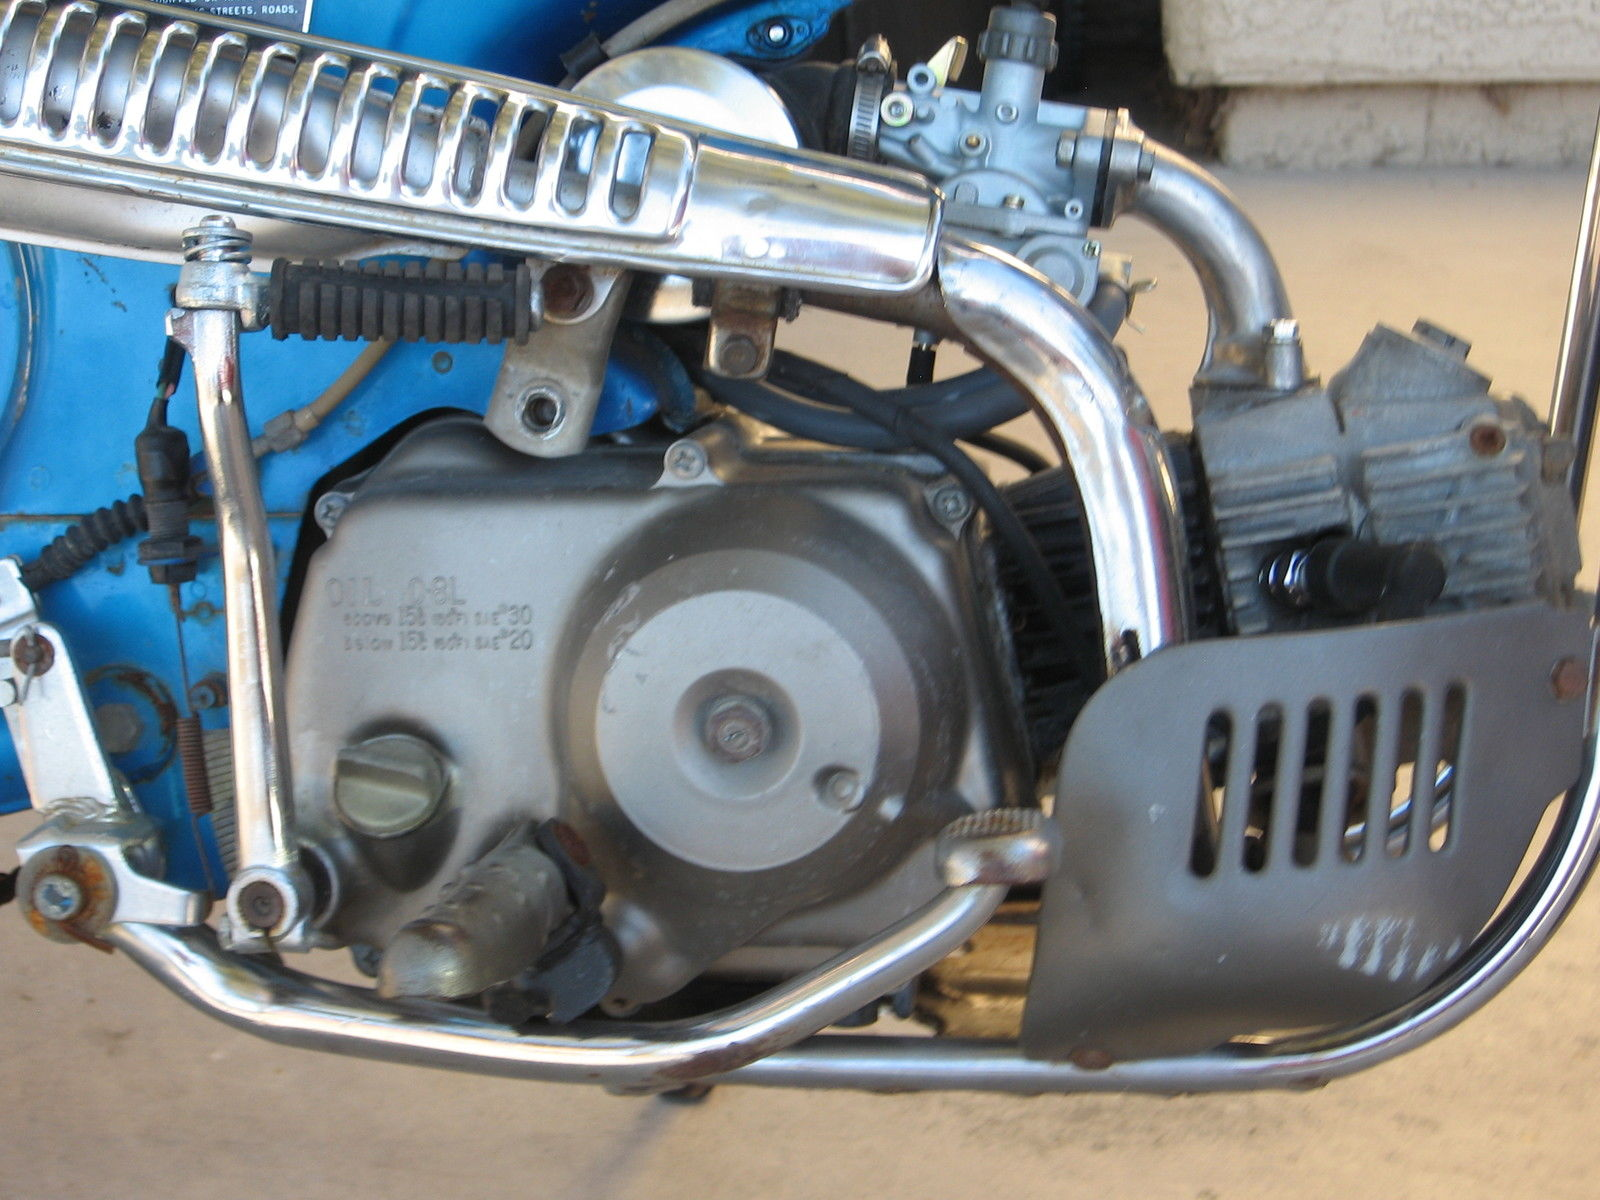 1970 Honda Mini Trail Ct 70 Ct70 Pit Bike Motorcycle Ko K0 Carburetor Other